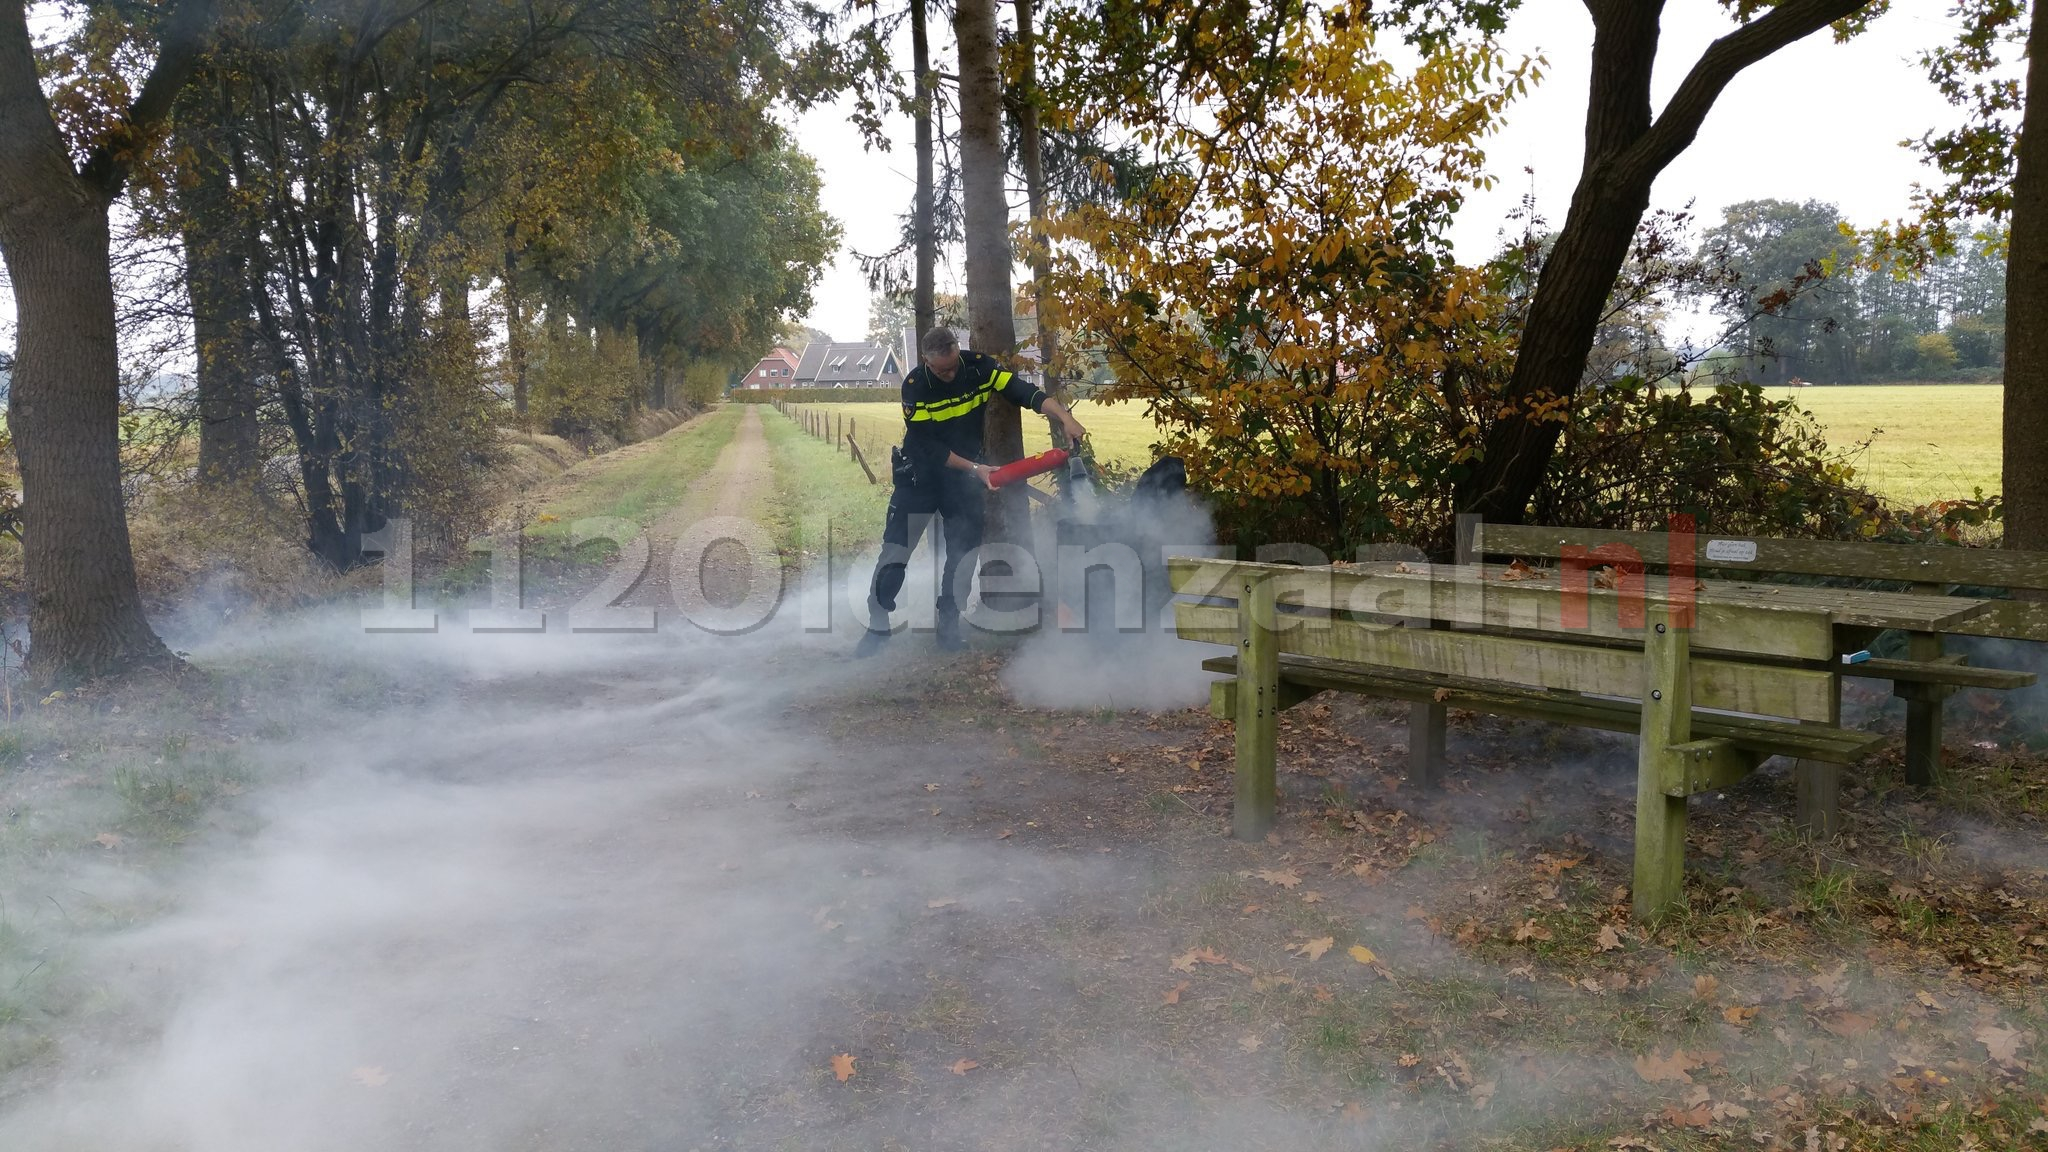 Foto: Politie blust brandende afvalbak in Lemselo